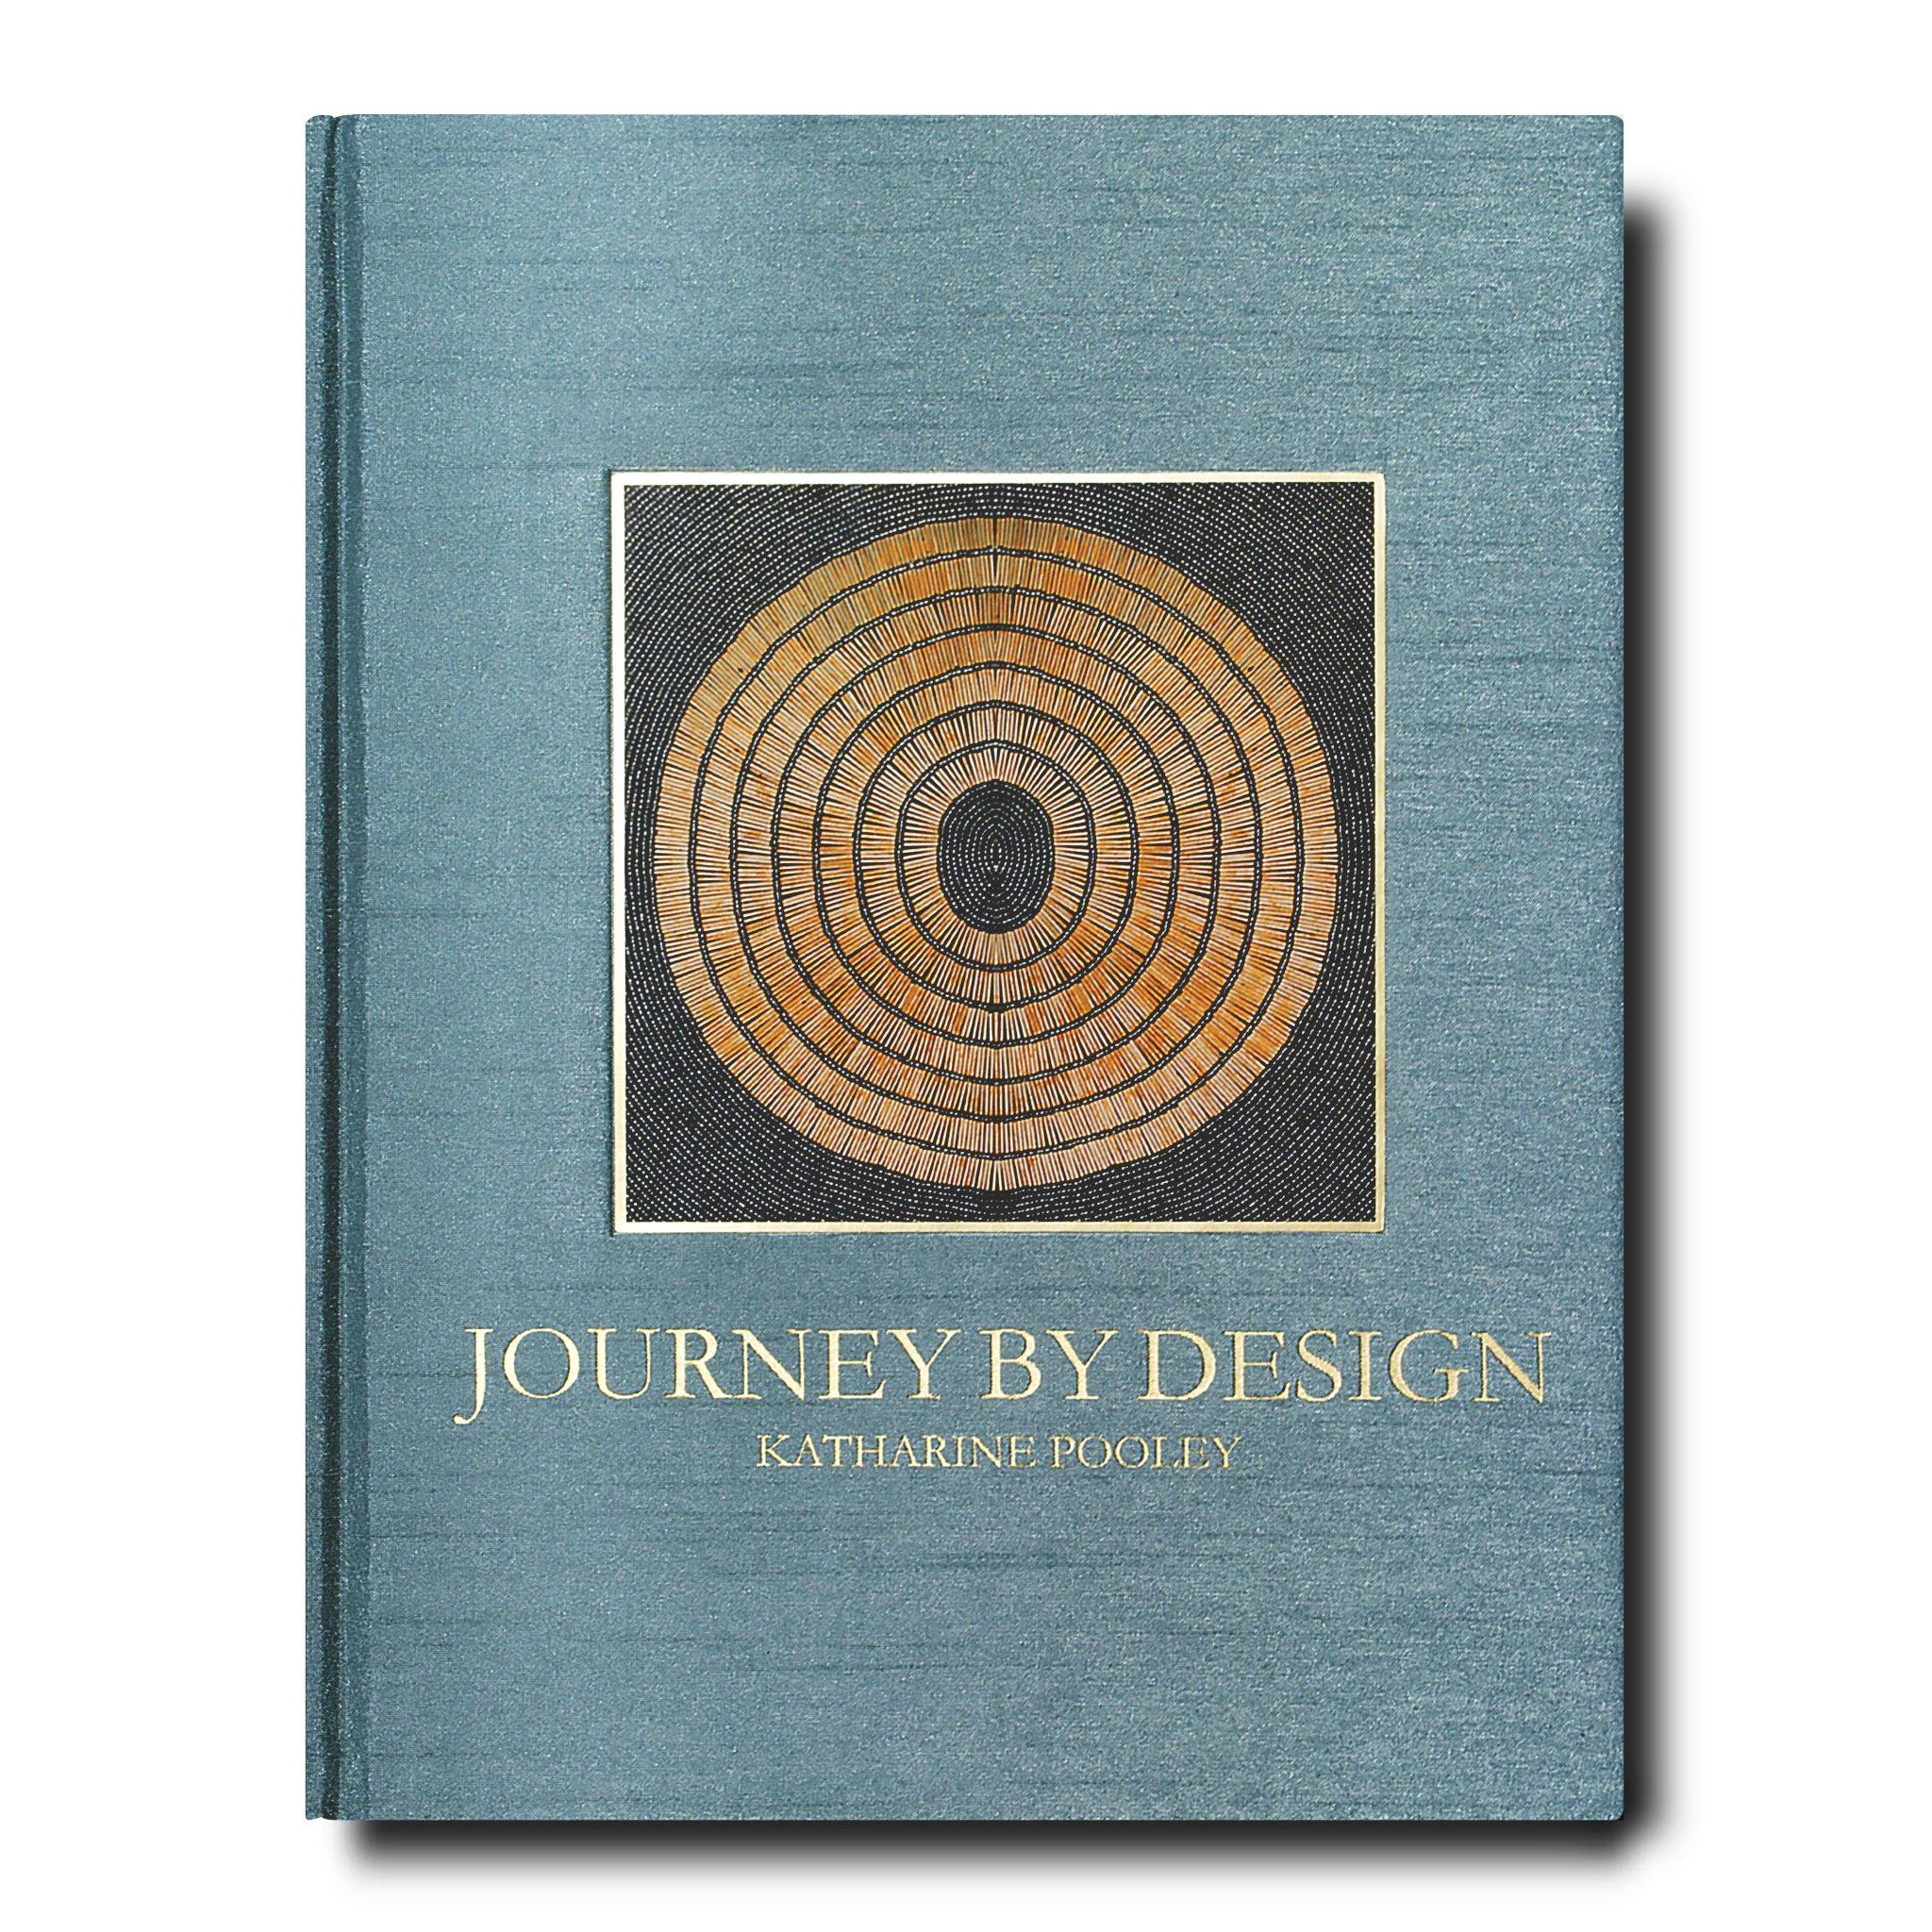 Interiors ADvent Calendar - Journey by Design by Katherine Pooley - Masha Shapiro Agency UK.jpg